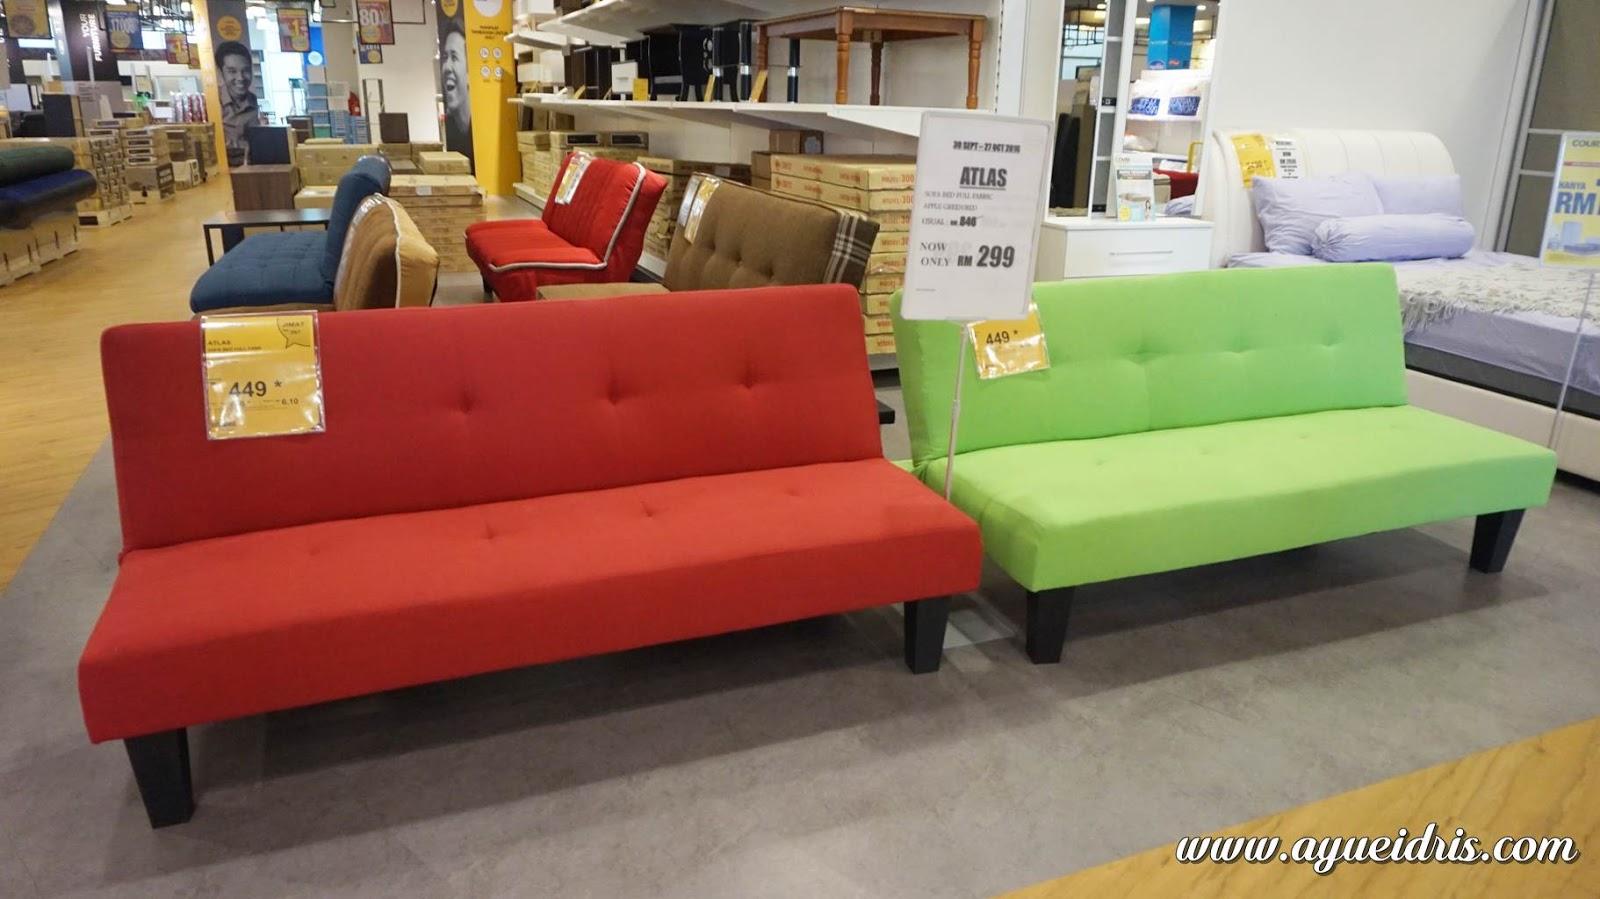 courts sofa retro leather john lewis beli tilam queen rm399 di pesta terbesar